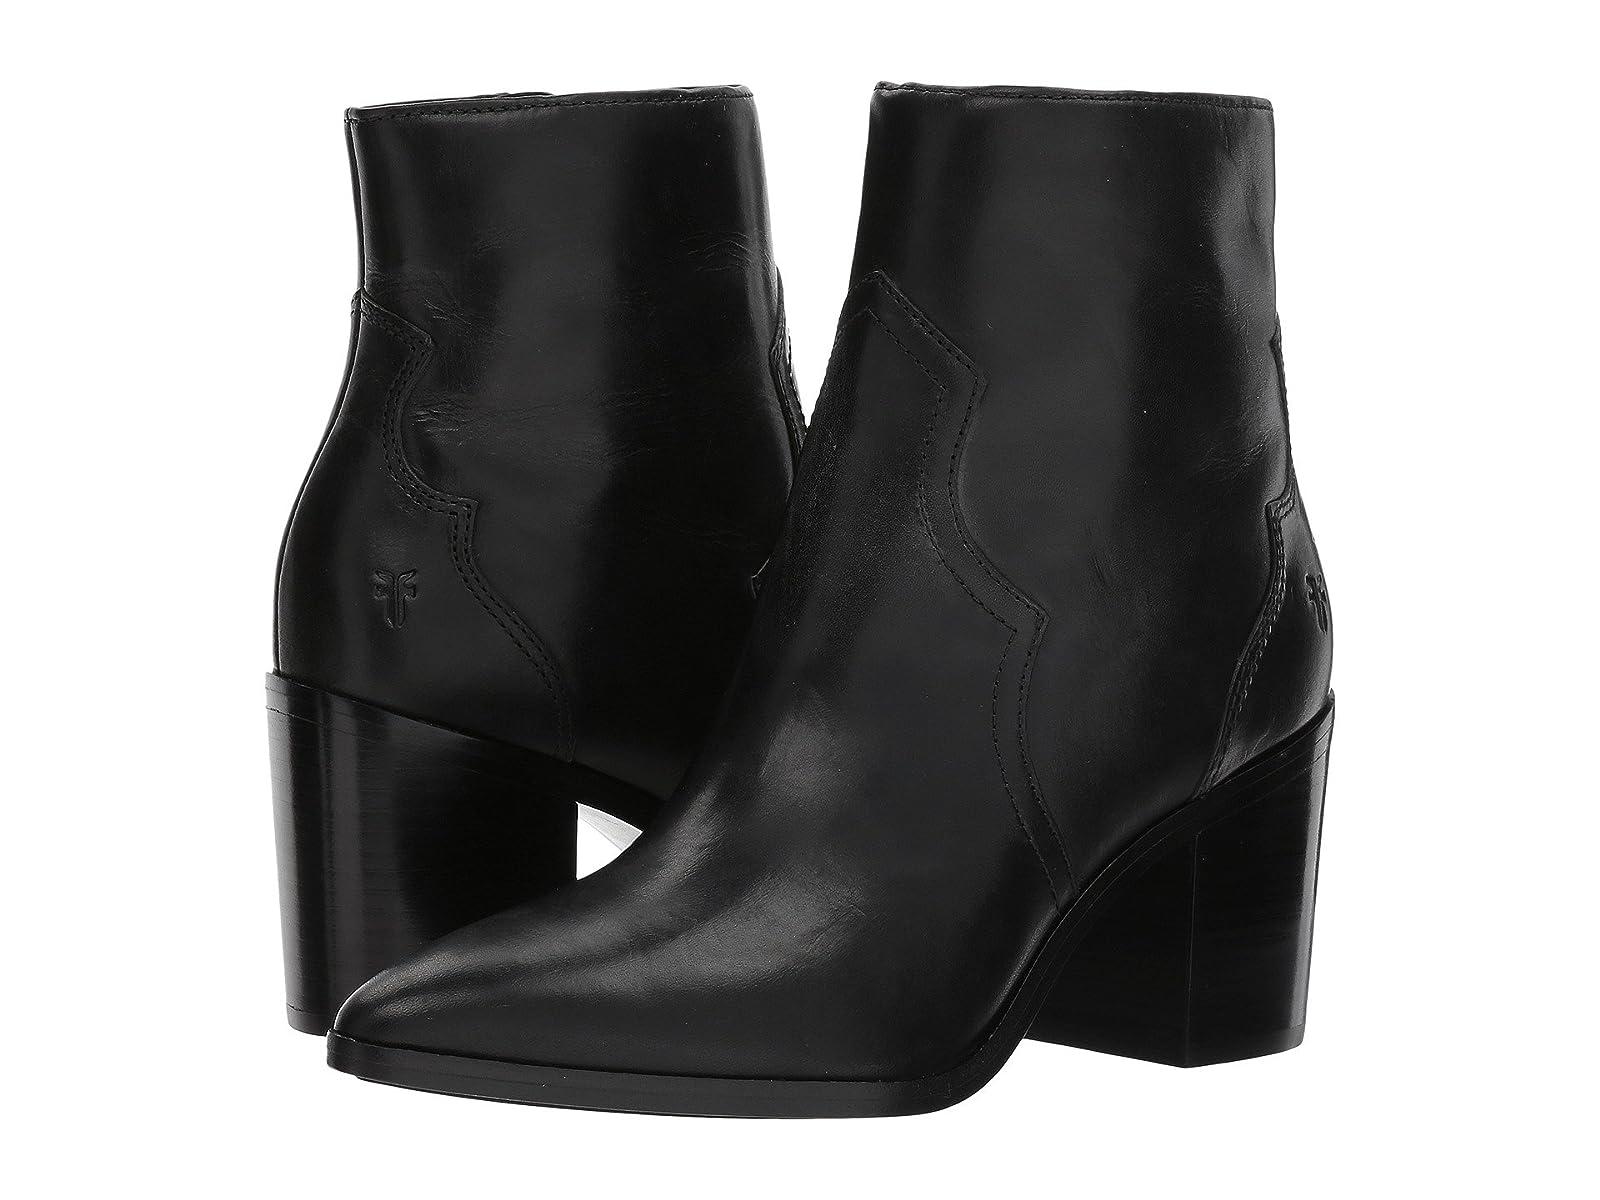 Frye Flynn Short Inside ZipAffordable and distinctive shoes